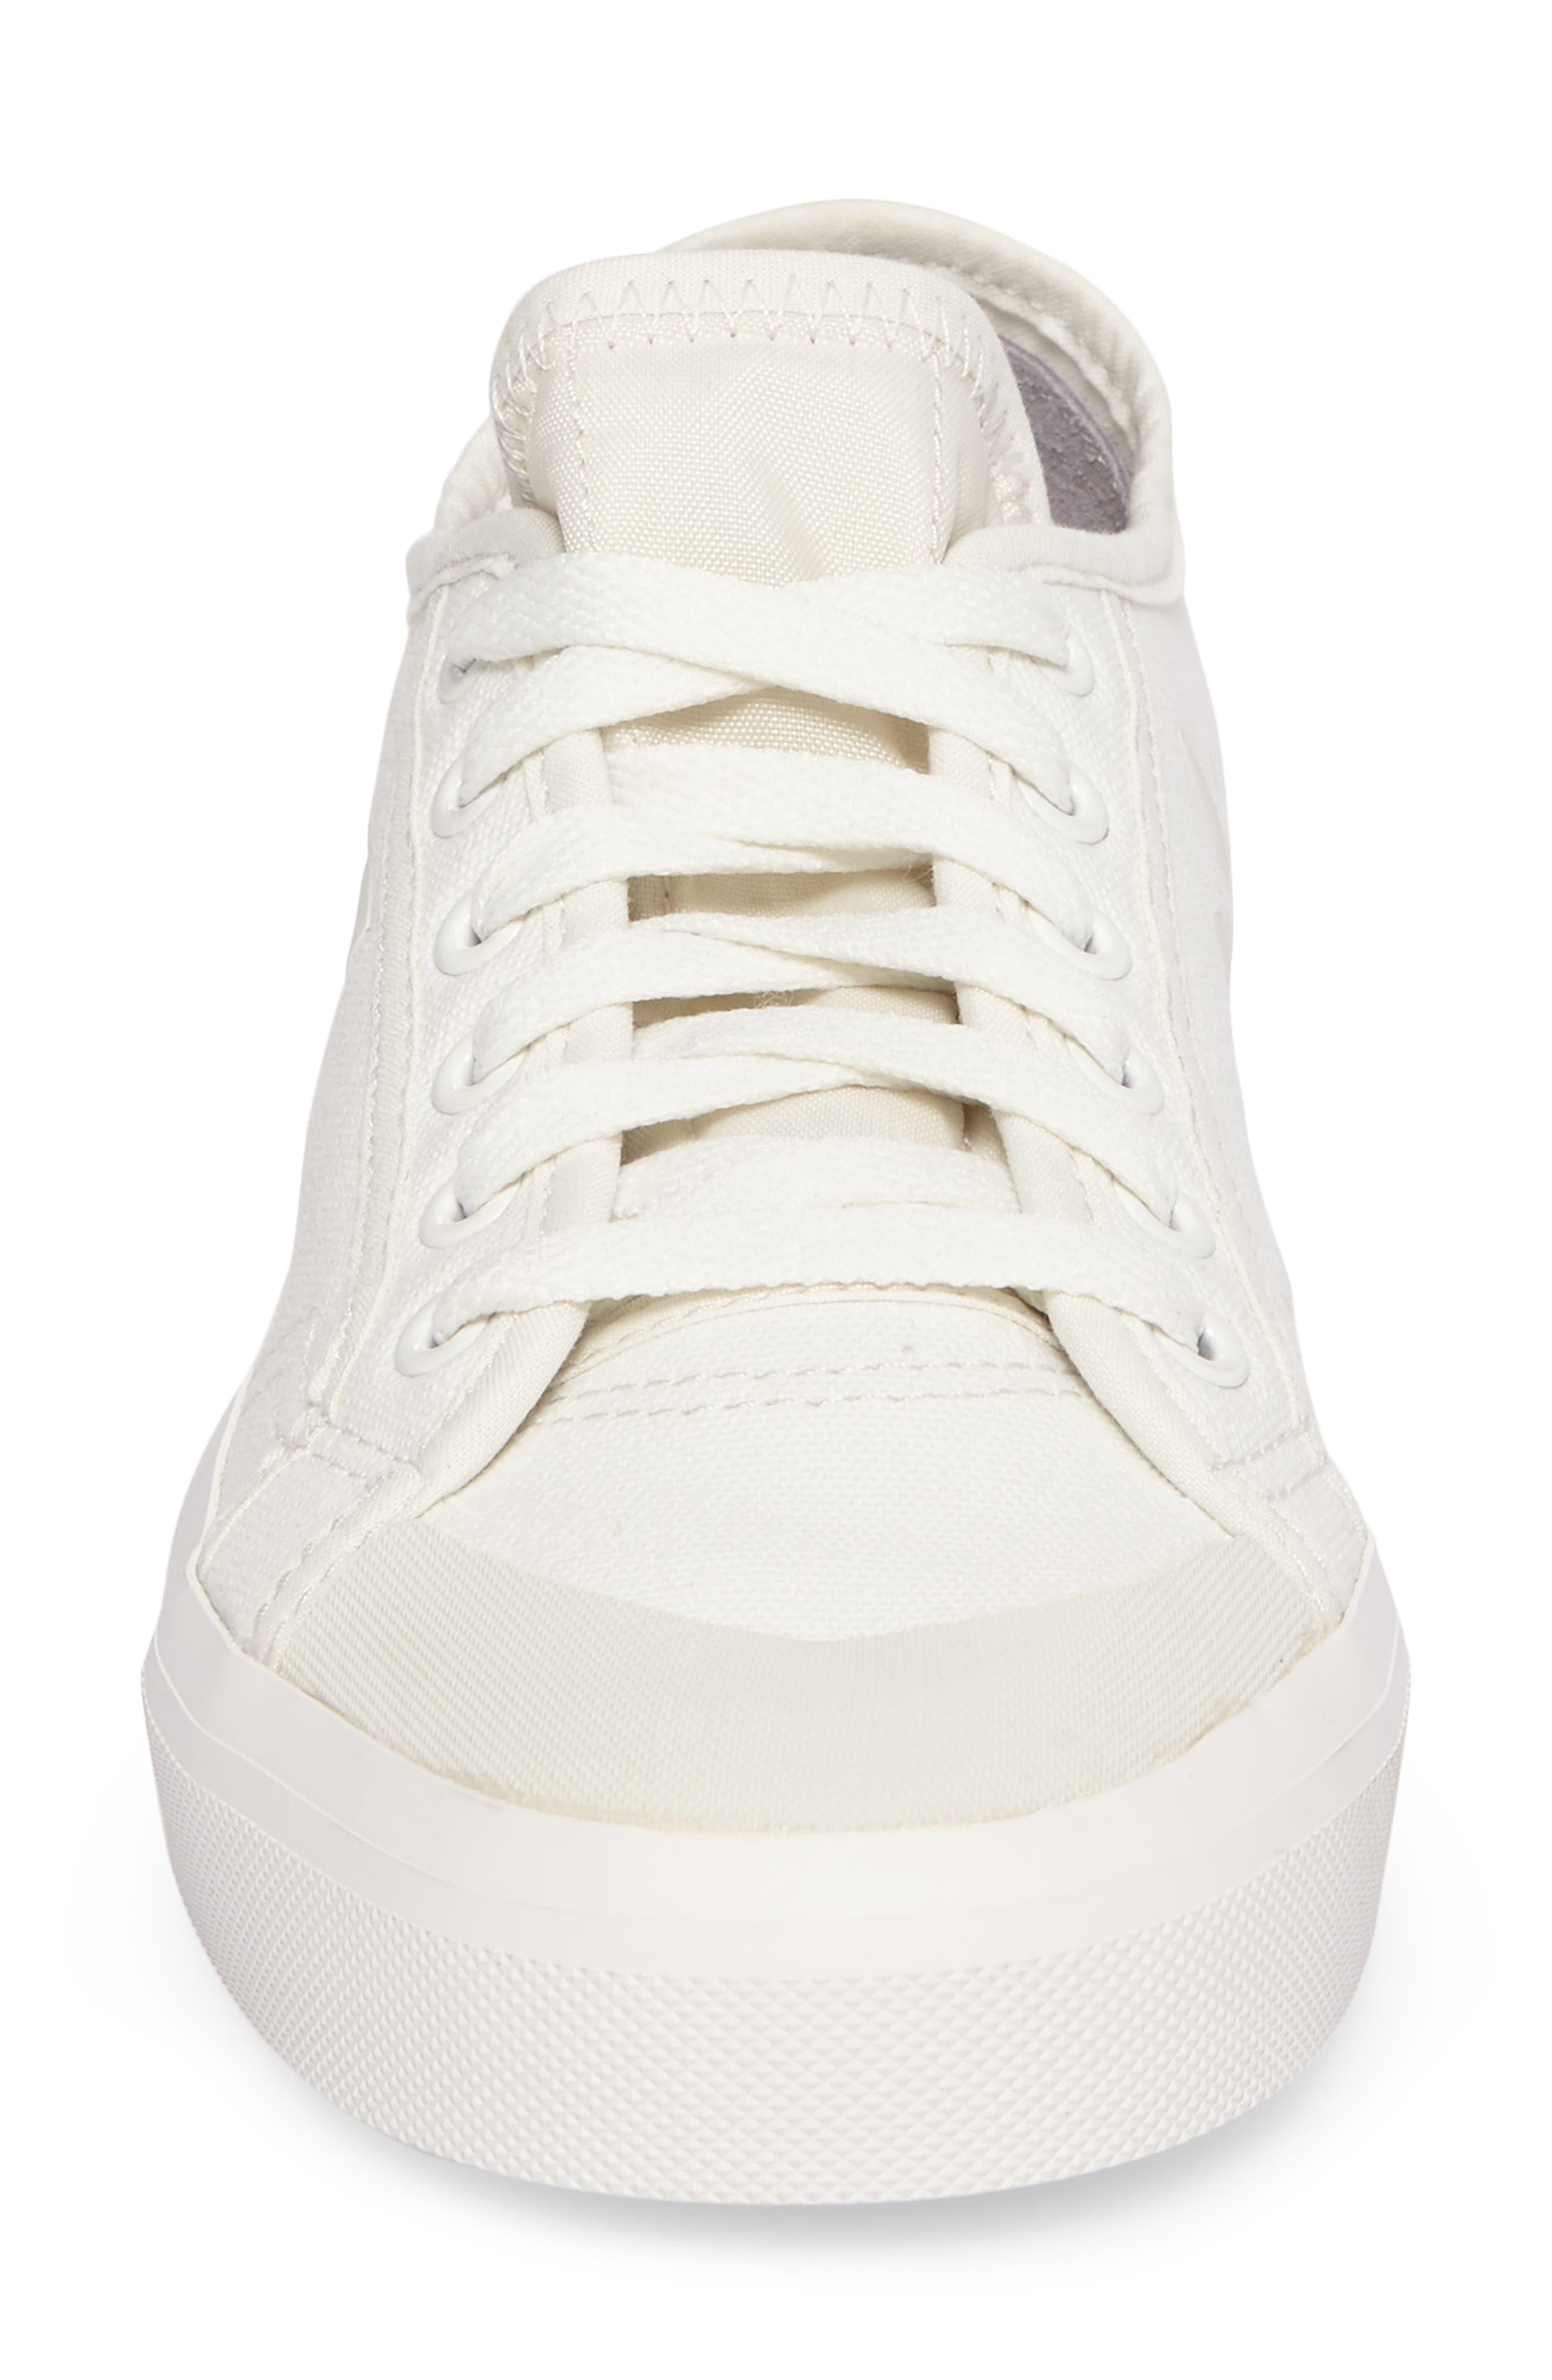 adidas by Raf Simons Spirit Low Top Sneaker,                             Alternate thumbnail 4, color,                             Optic White